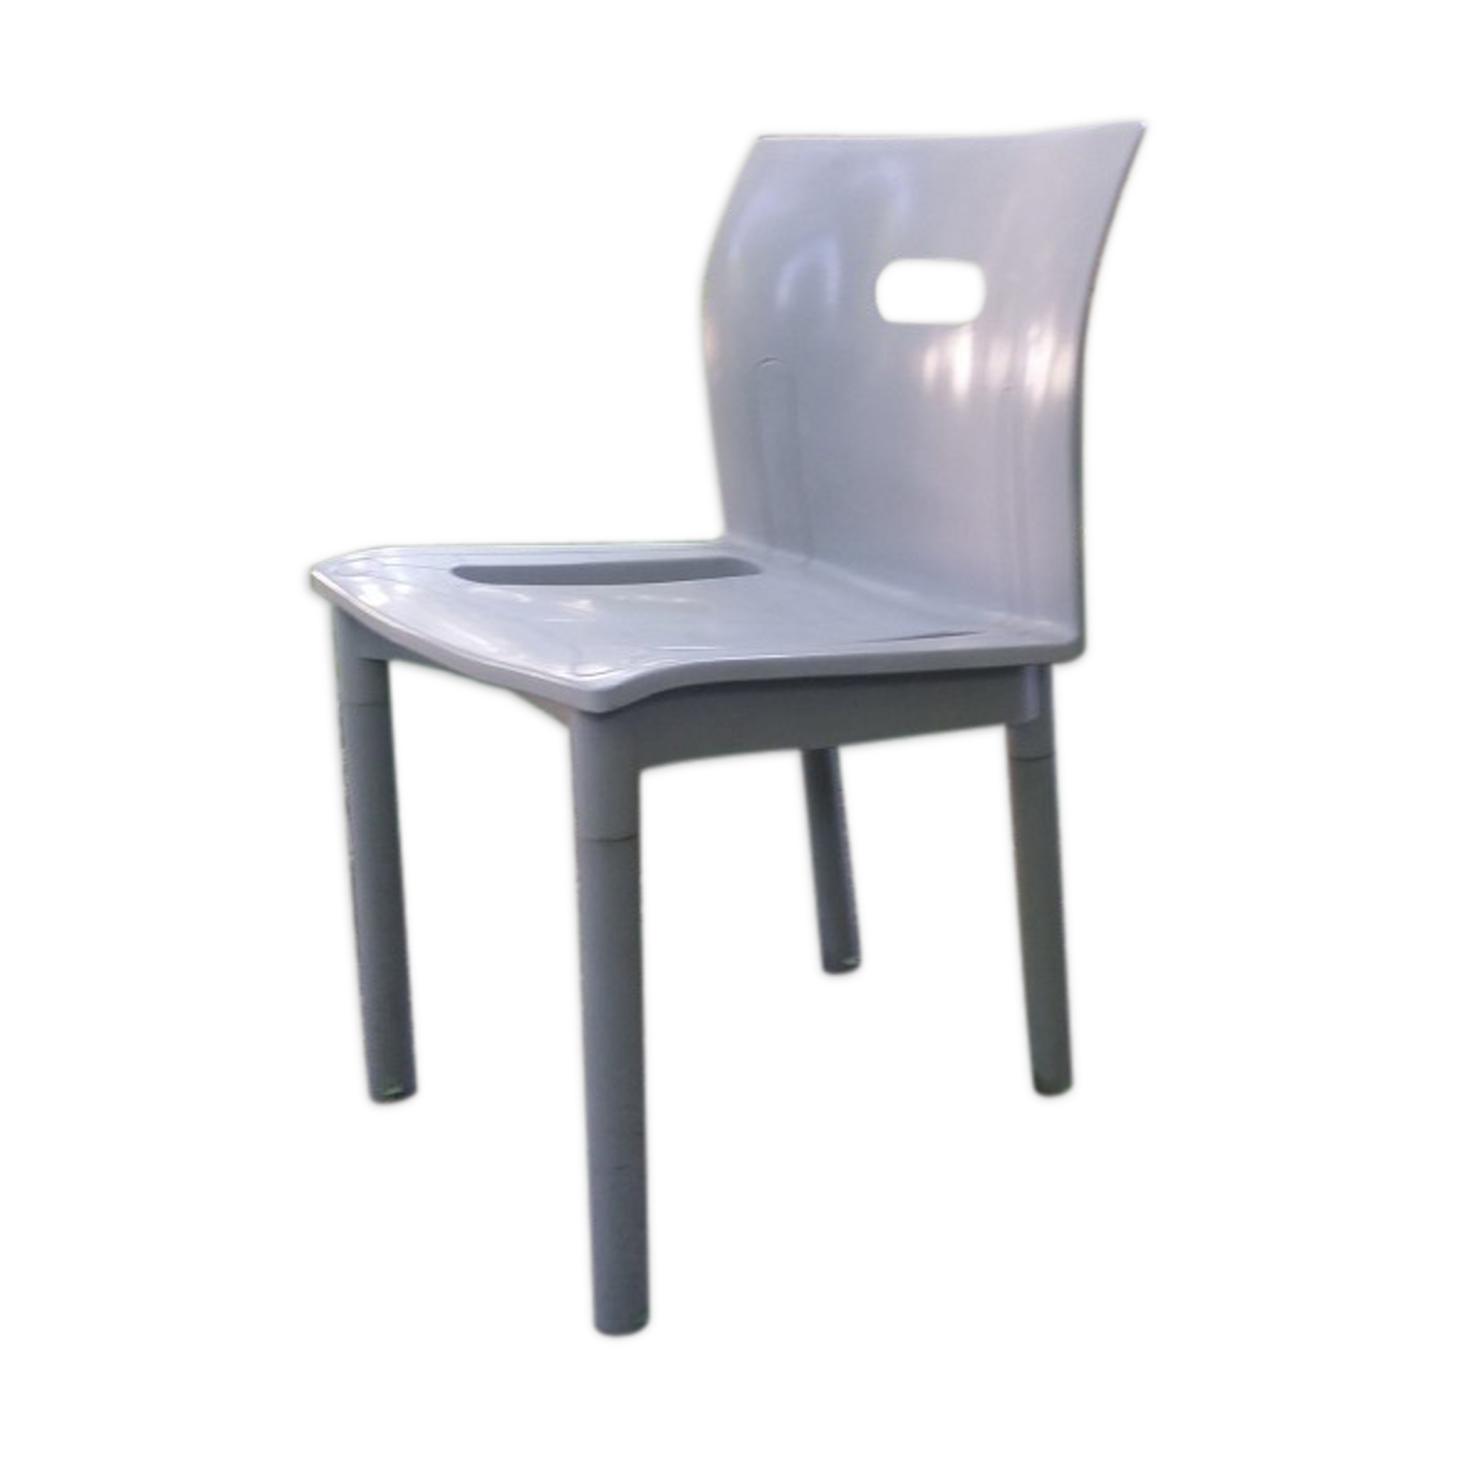 Chaise salon de jardin Anna Castelli Kartell vintage années 80 Design